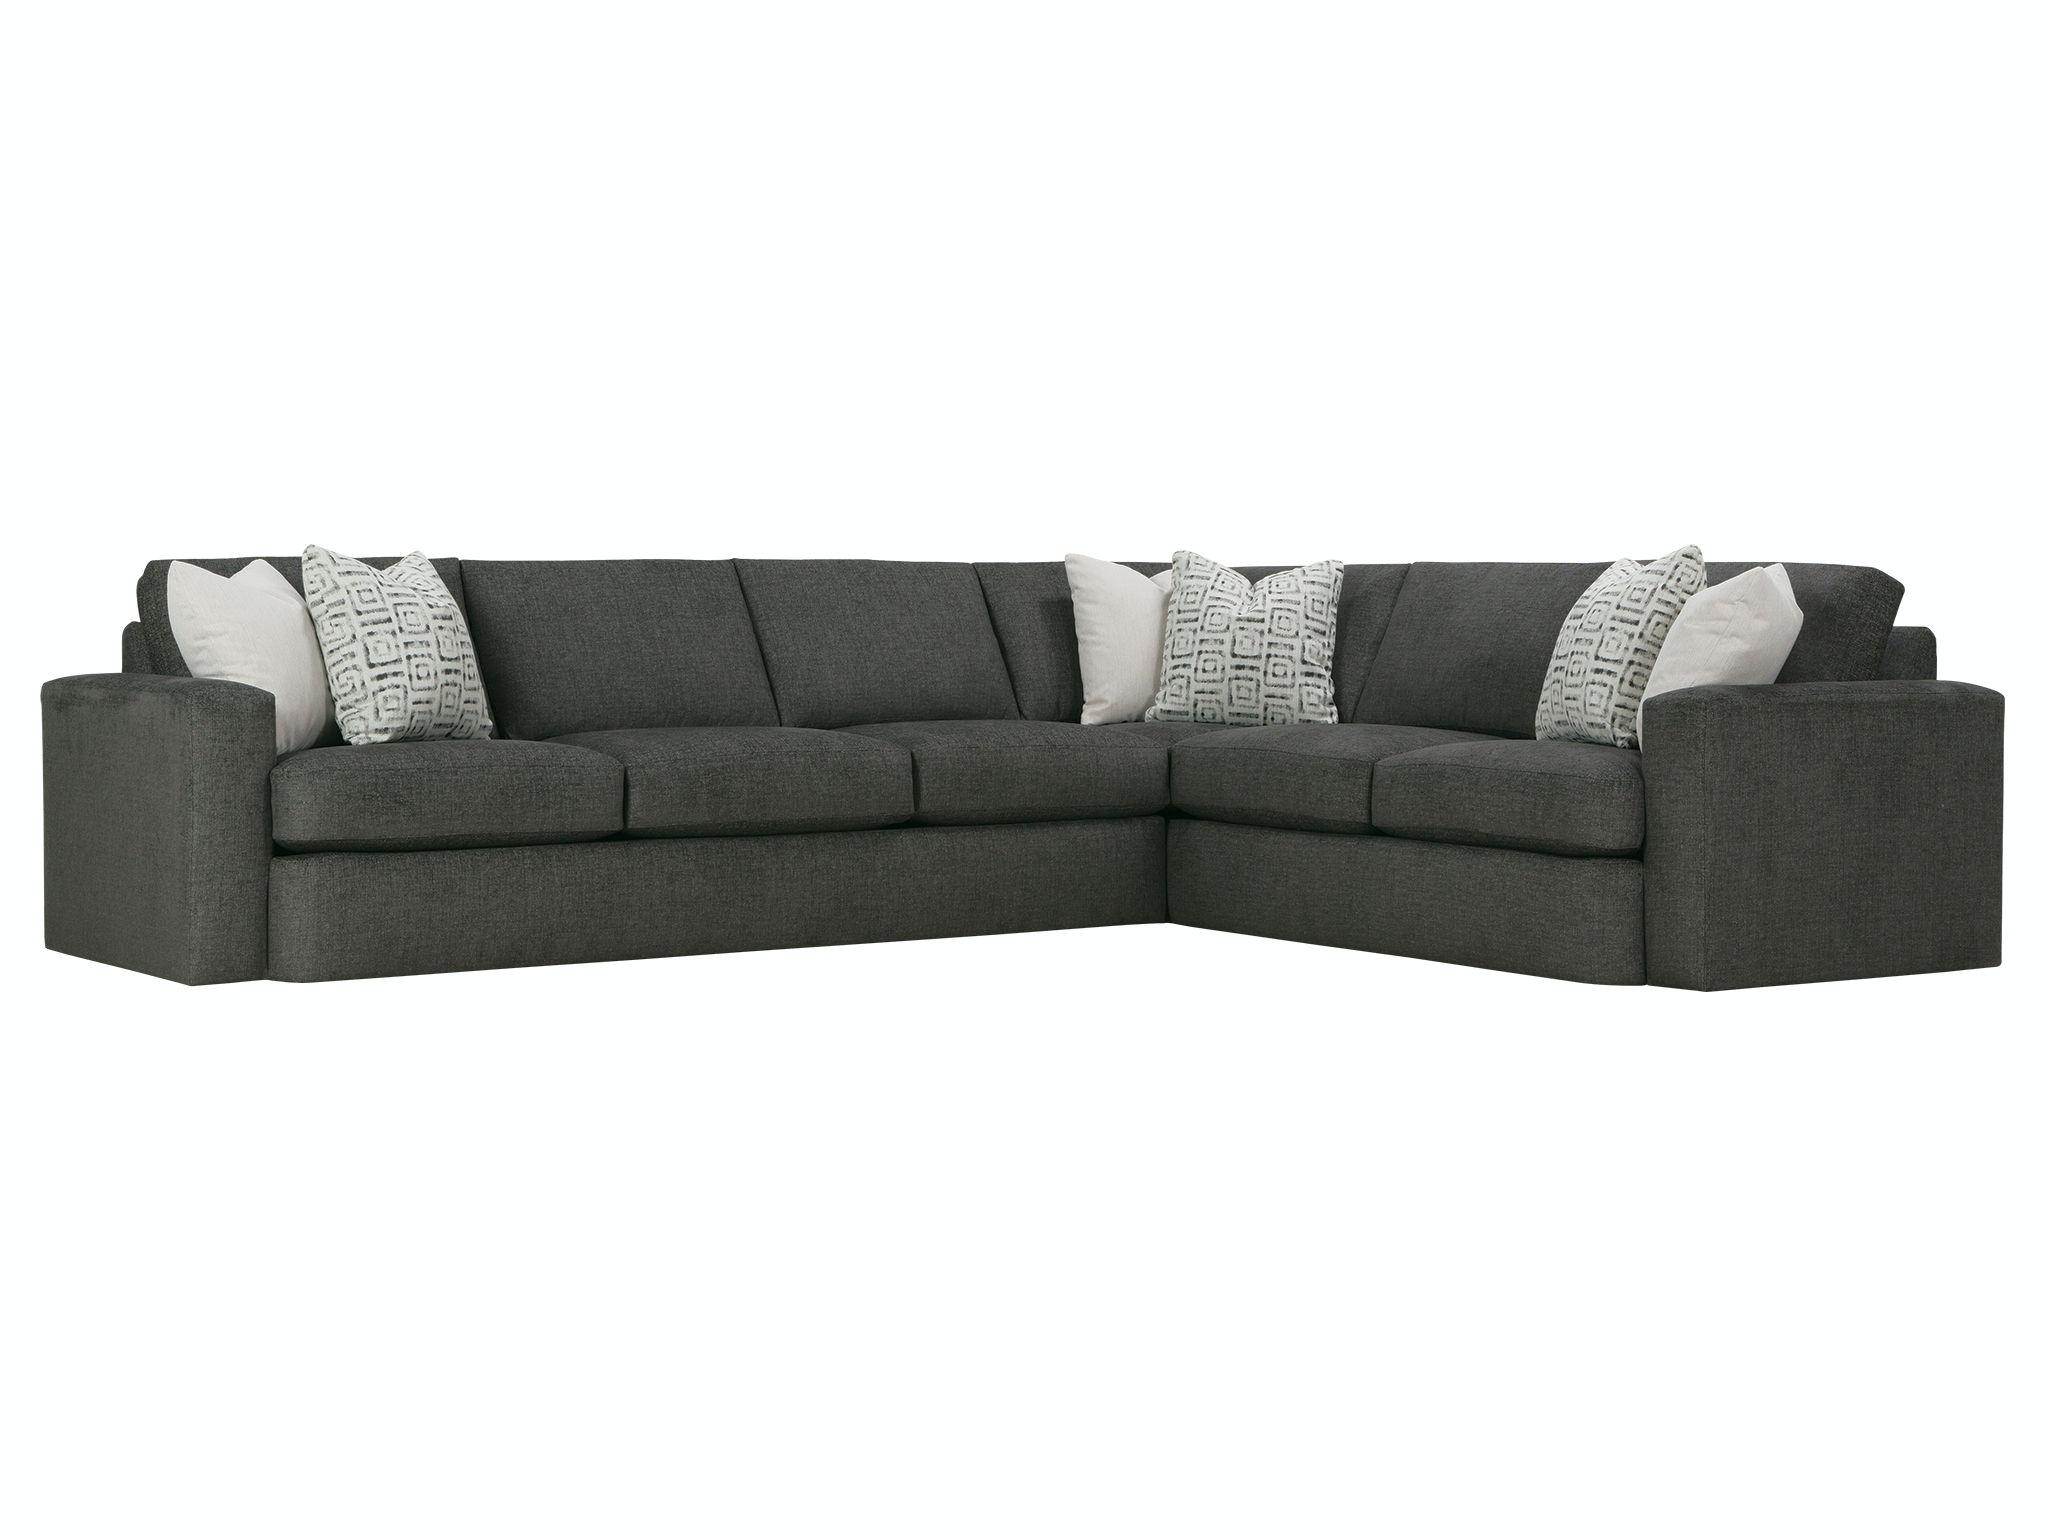 sectional sofa dallas fort worth set below 5000 rowe living room lauren p350 sect charter